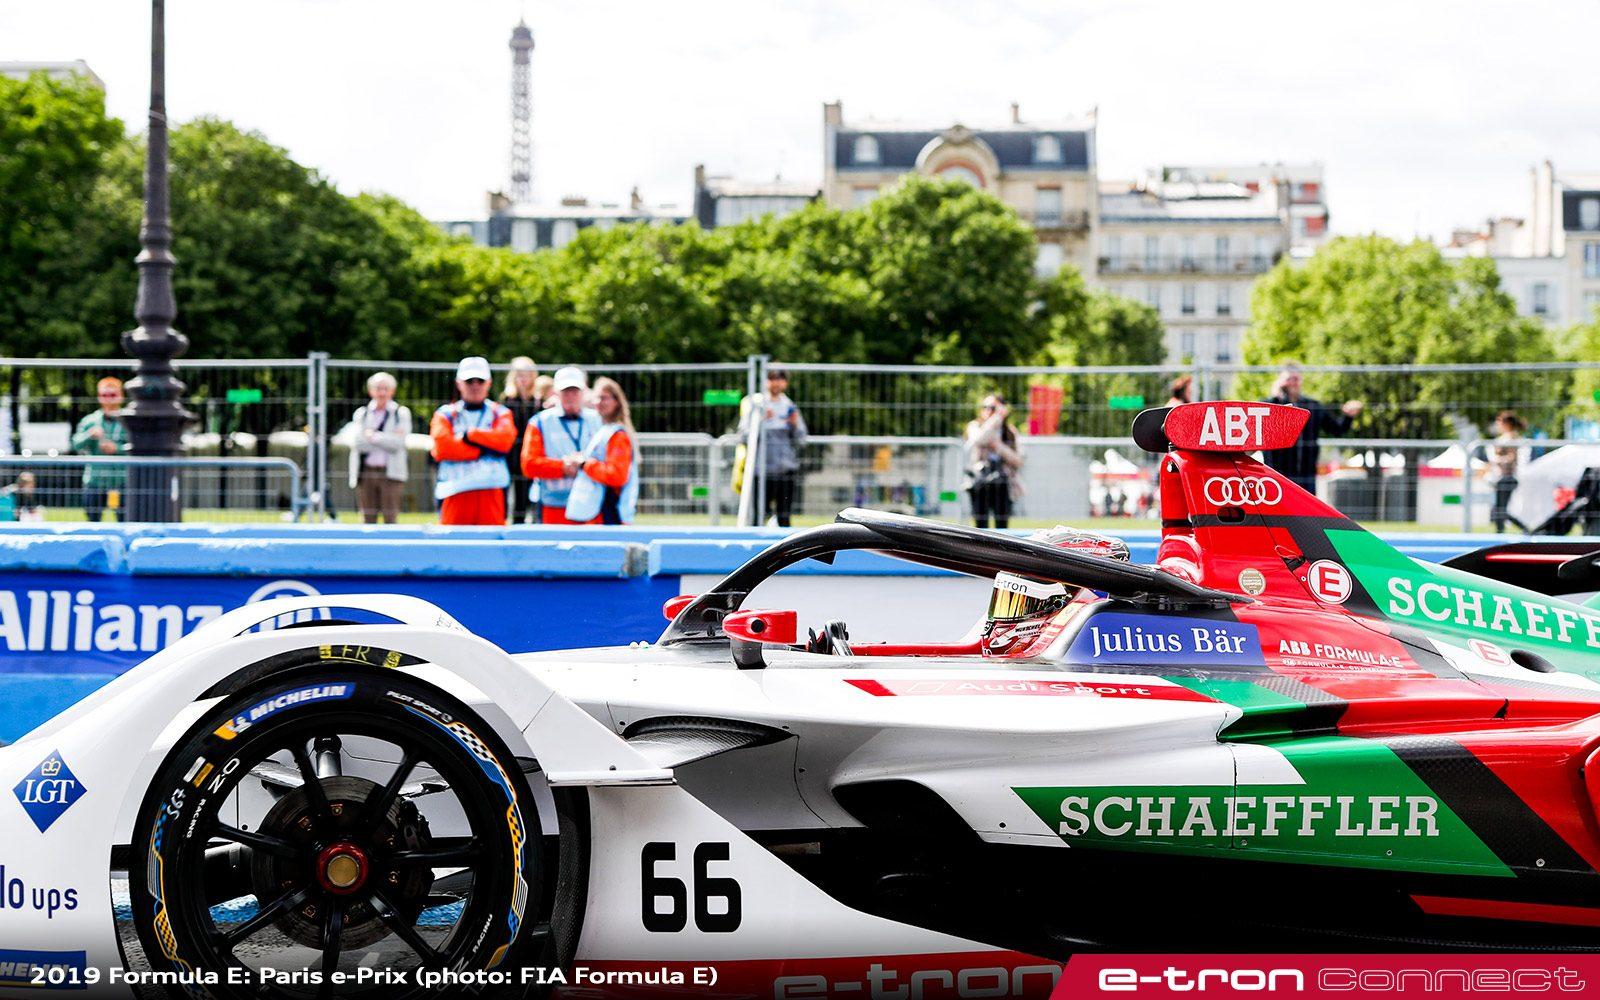 London and Seoul Star as New Additions on FIA Formula E